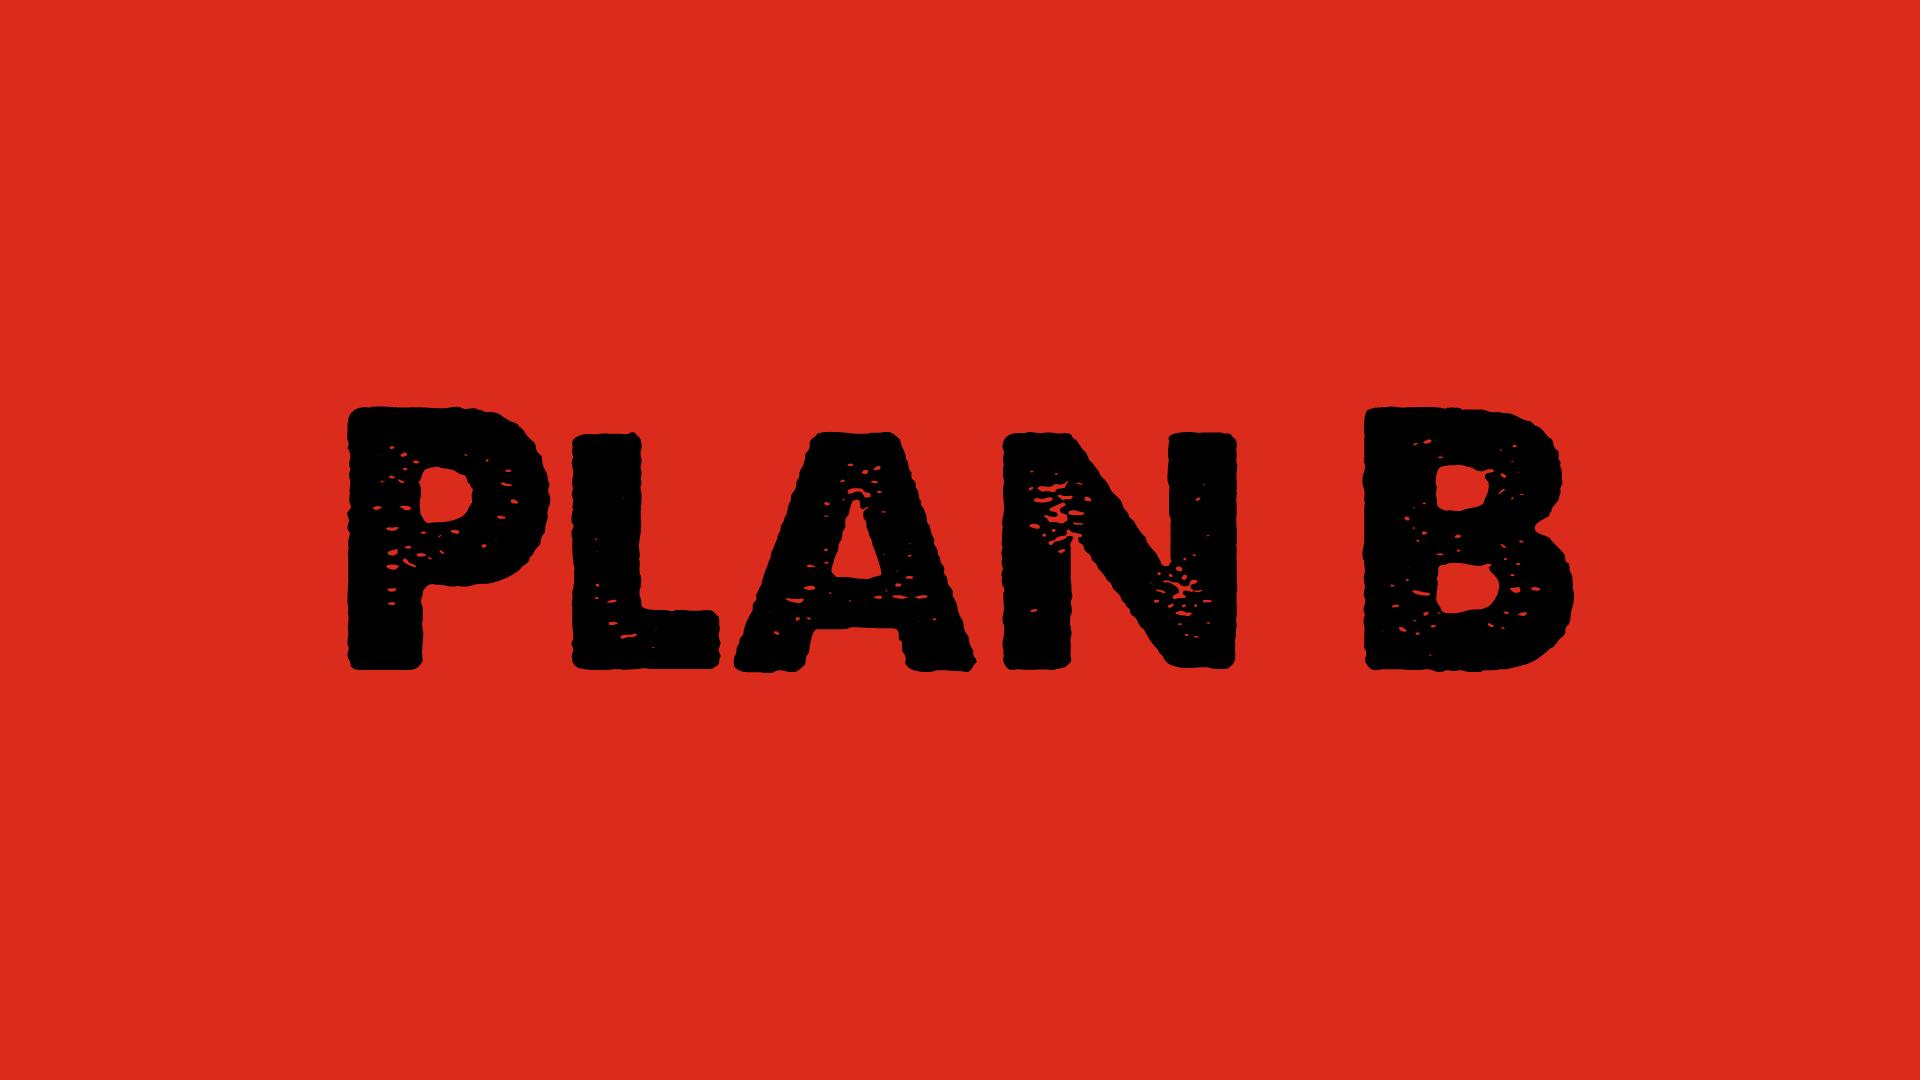 plan b wallpaper wallpapersafari. Black Bedroom Furniture Sets. Home Design Ideas